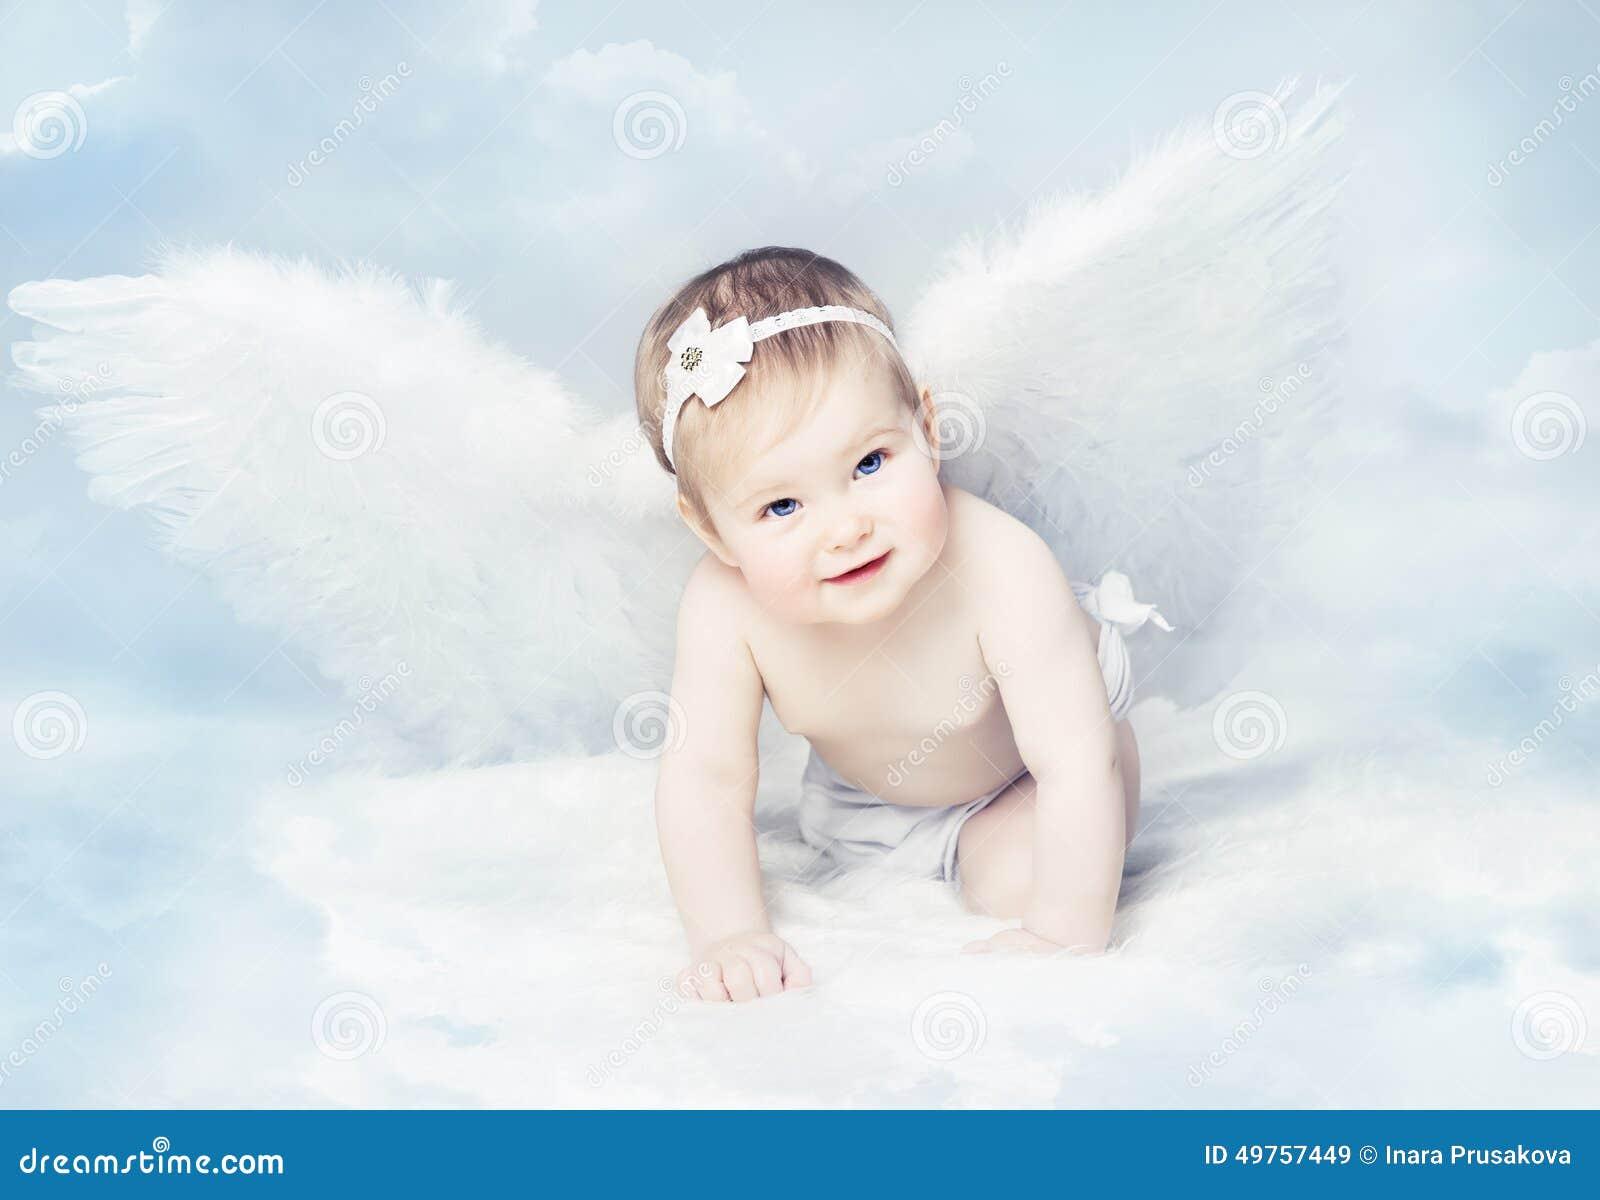 Дети и облака фото